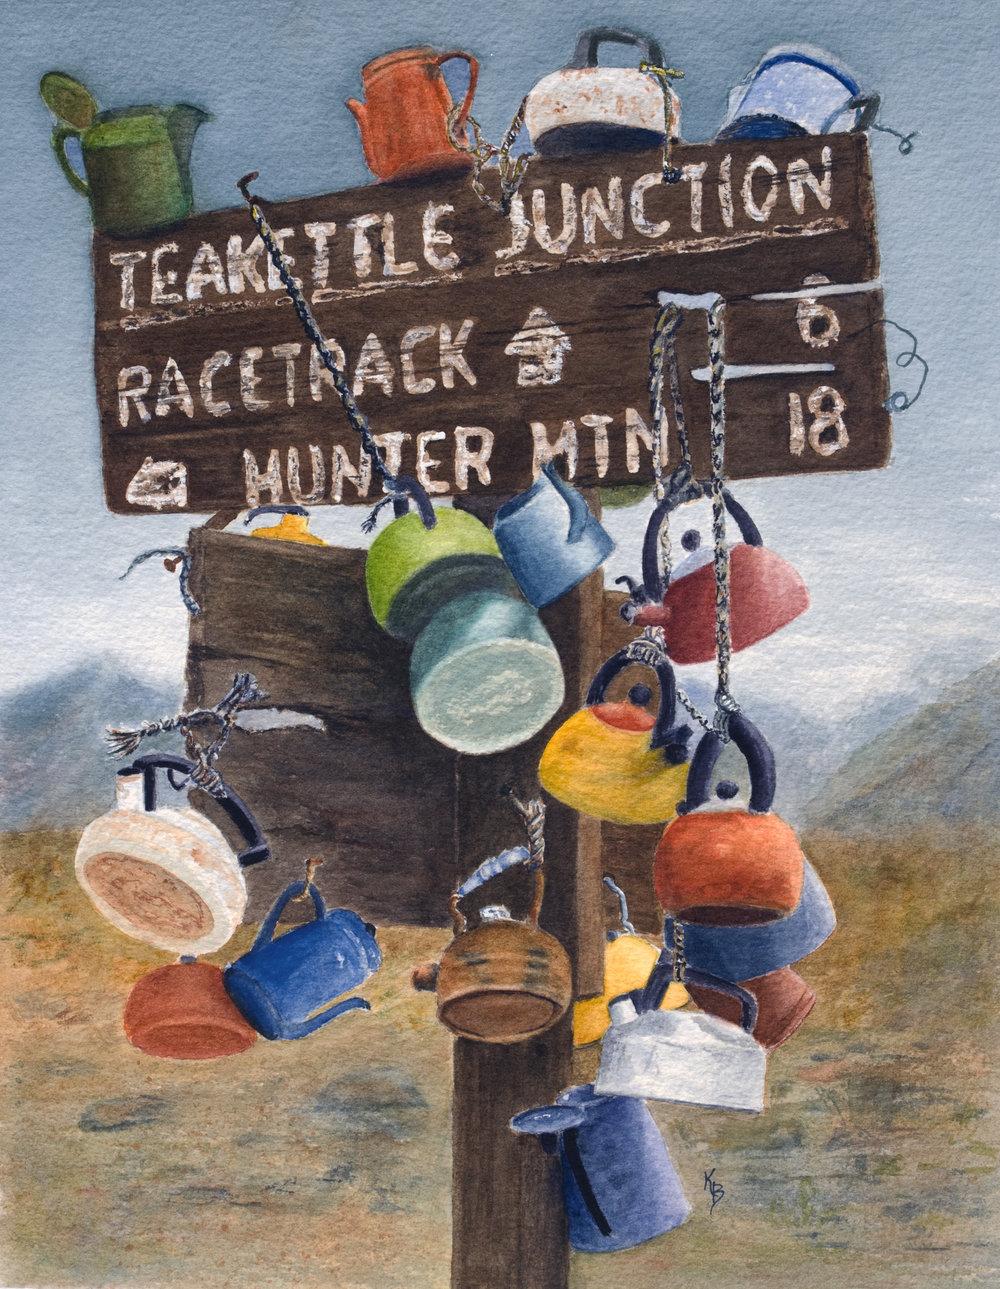 Teakettle Junction by Karen Flescher